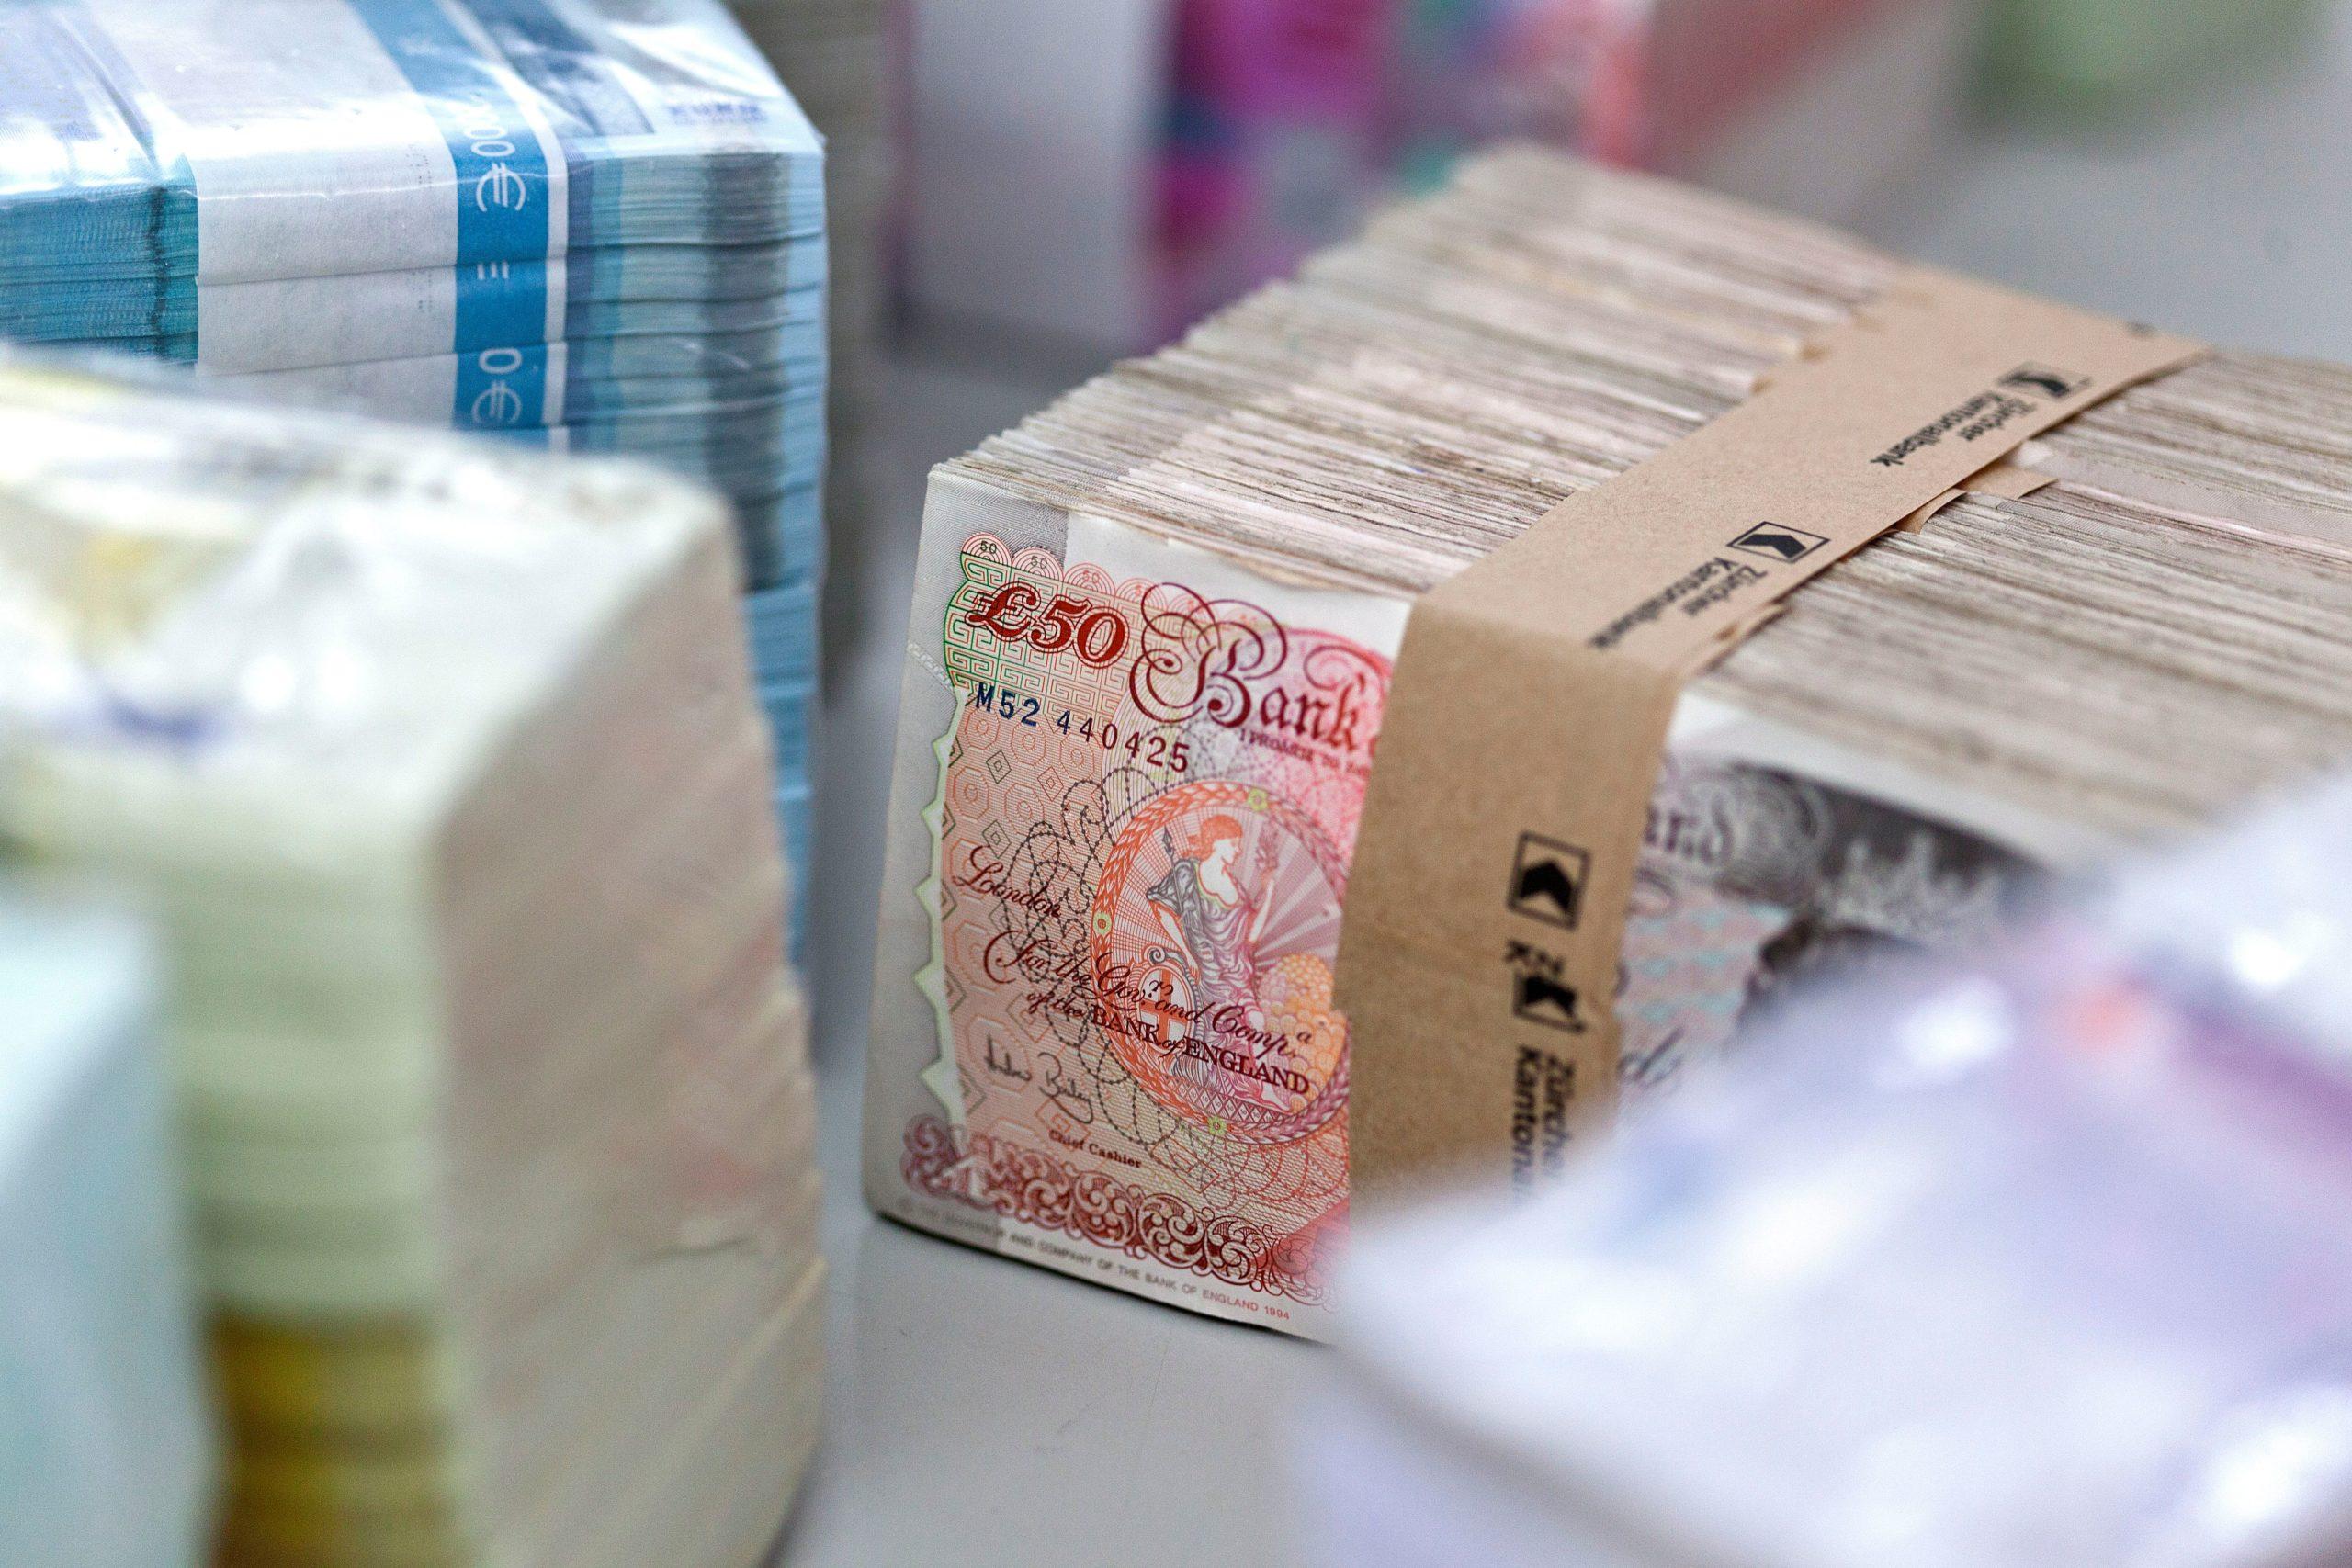 Bundles of bank notes